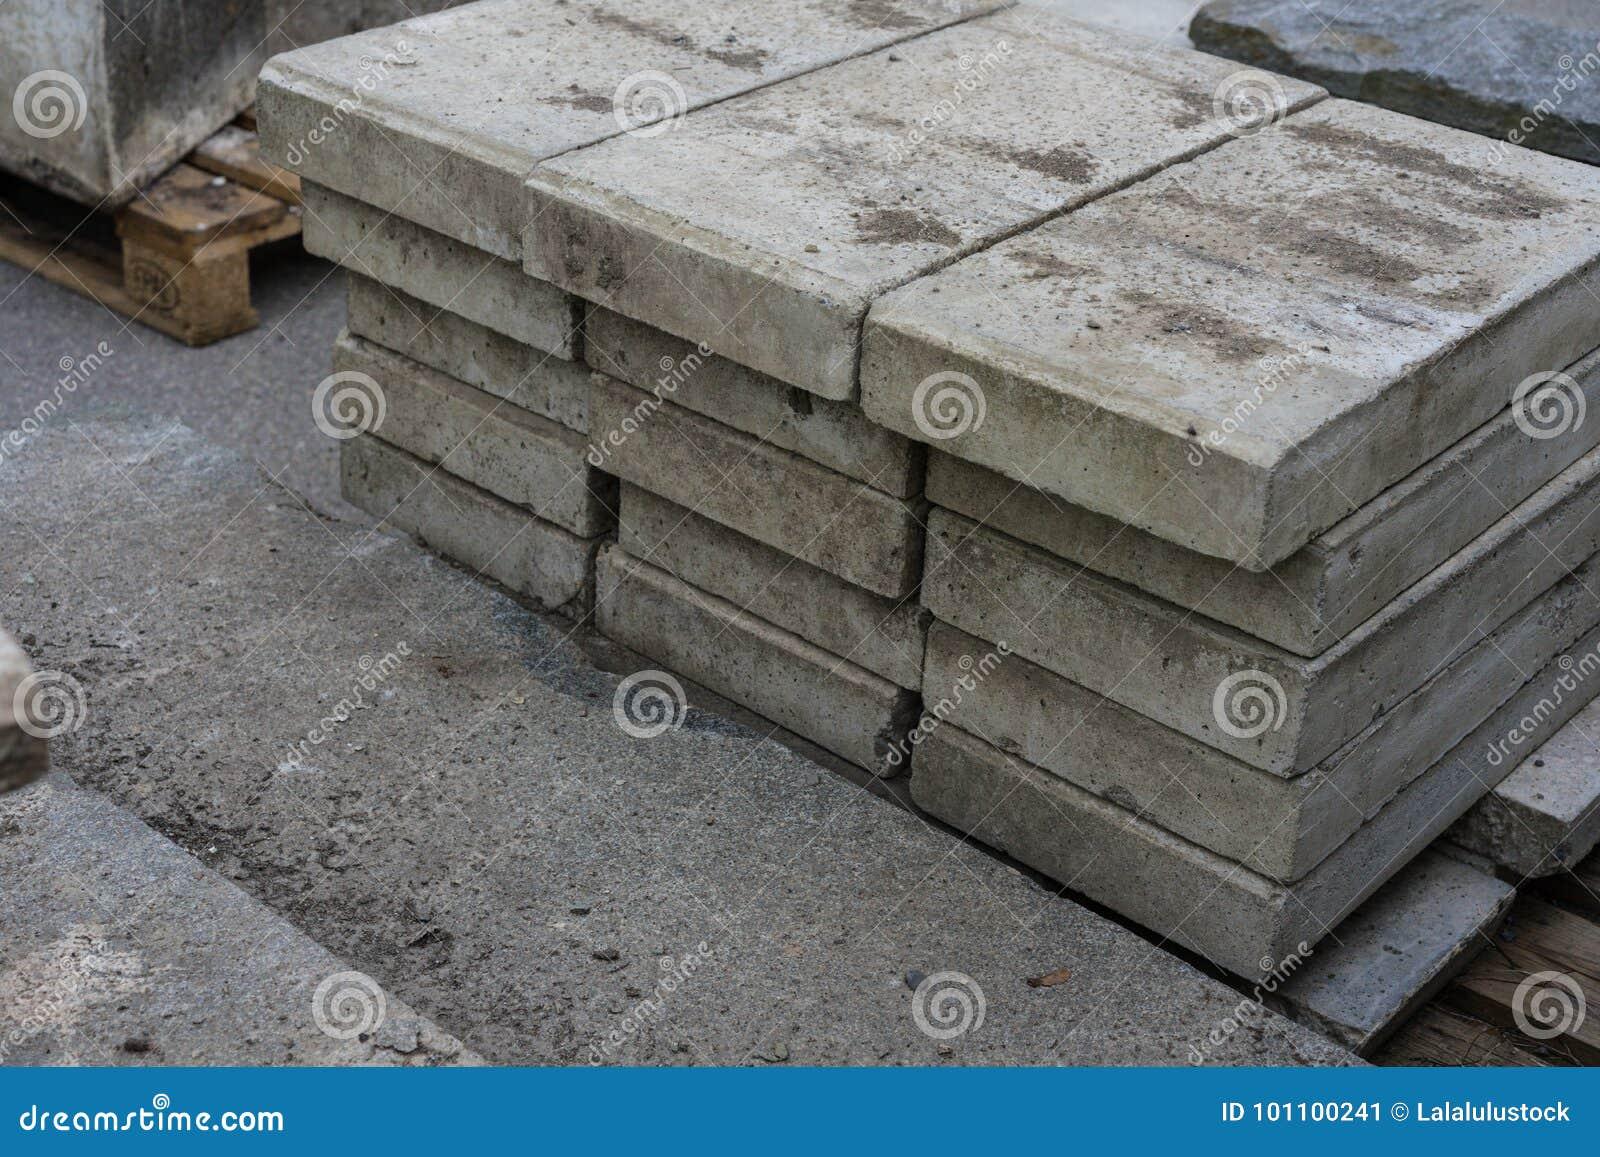 76dceb172d98 Τσιμεντένιοι ογκόλιθοι για την κατασκευή Στοκ Εικόνα - εικόνα από ...